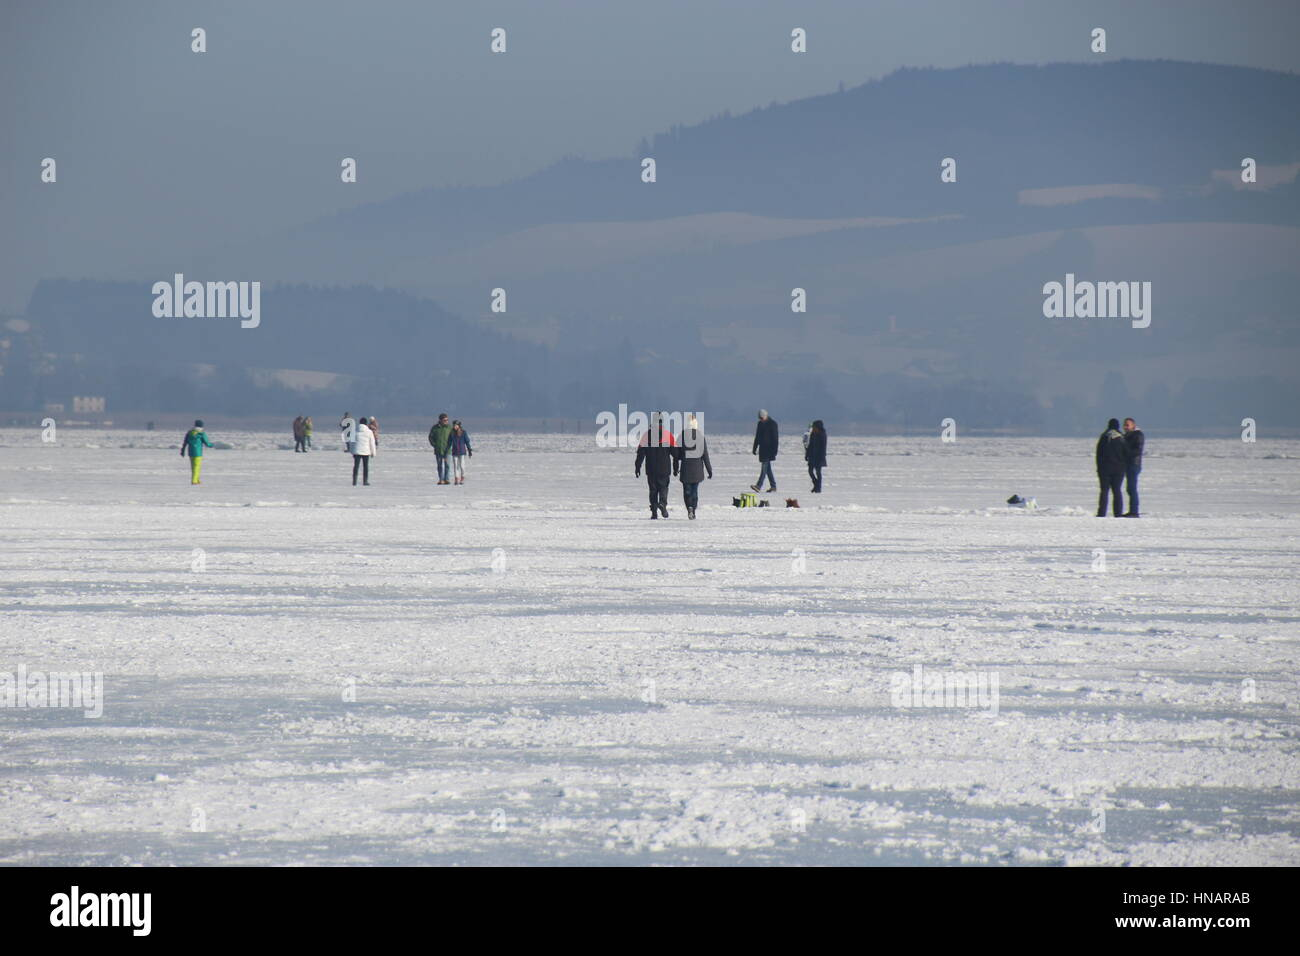 Many people walk on the frozen lake Wallersee in Seekirchen. Salzburger Land, Austria, Europe. - Stock Image